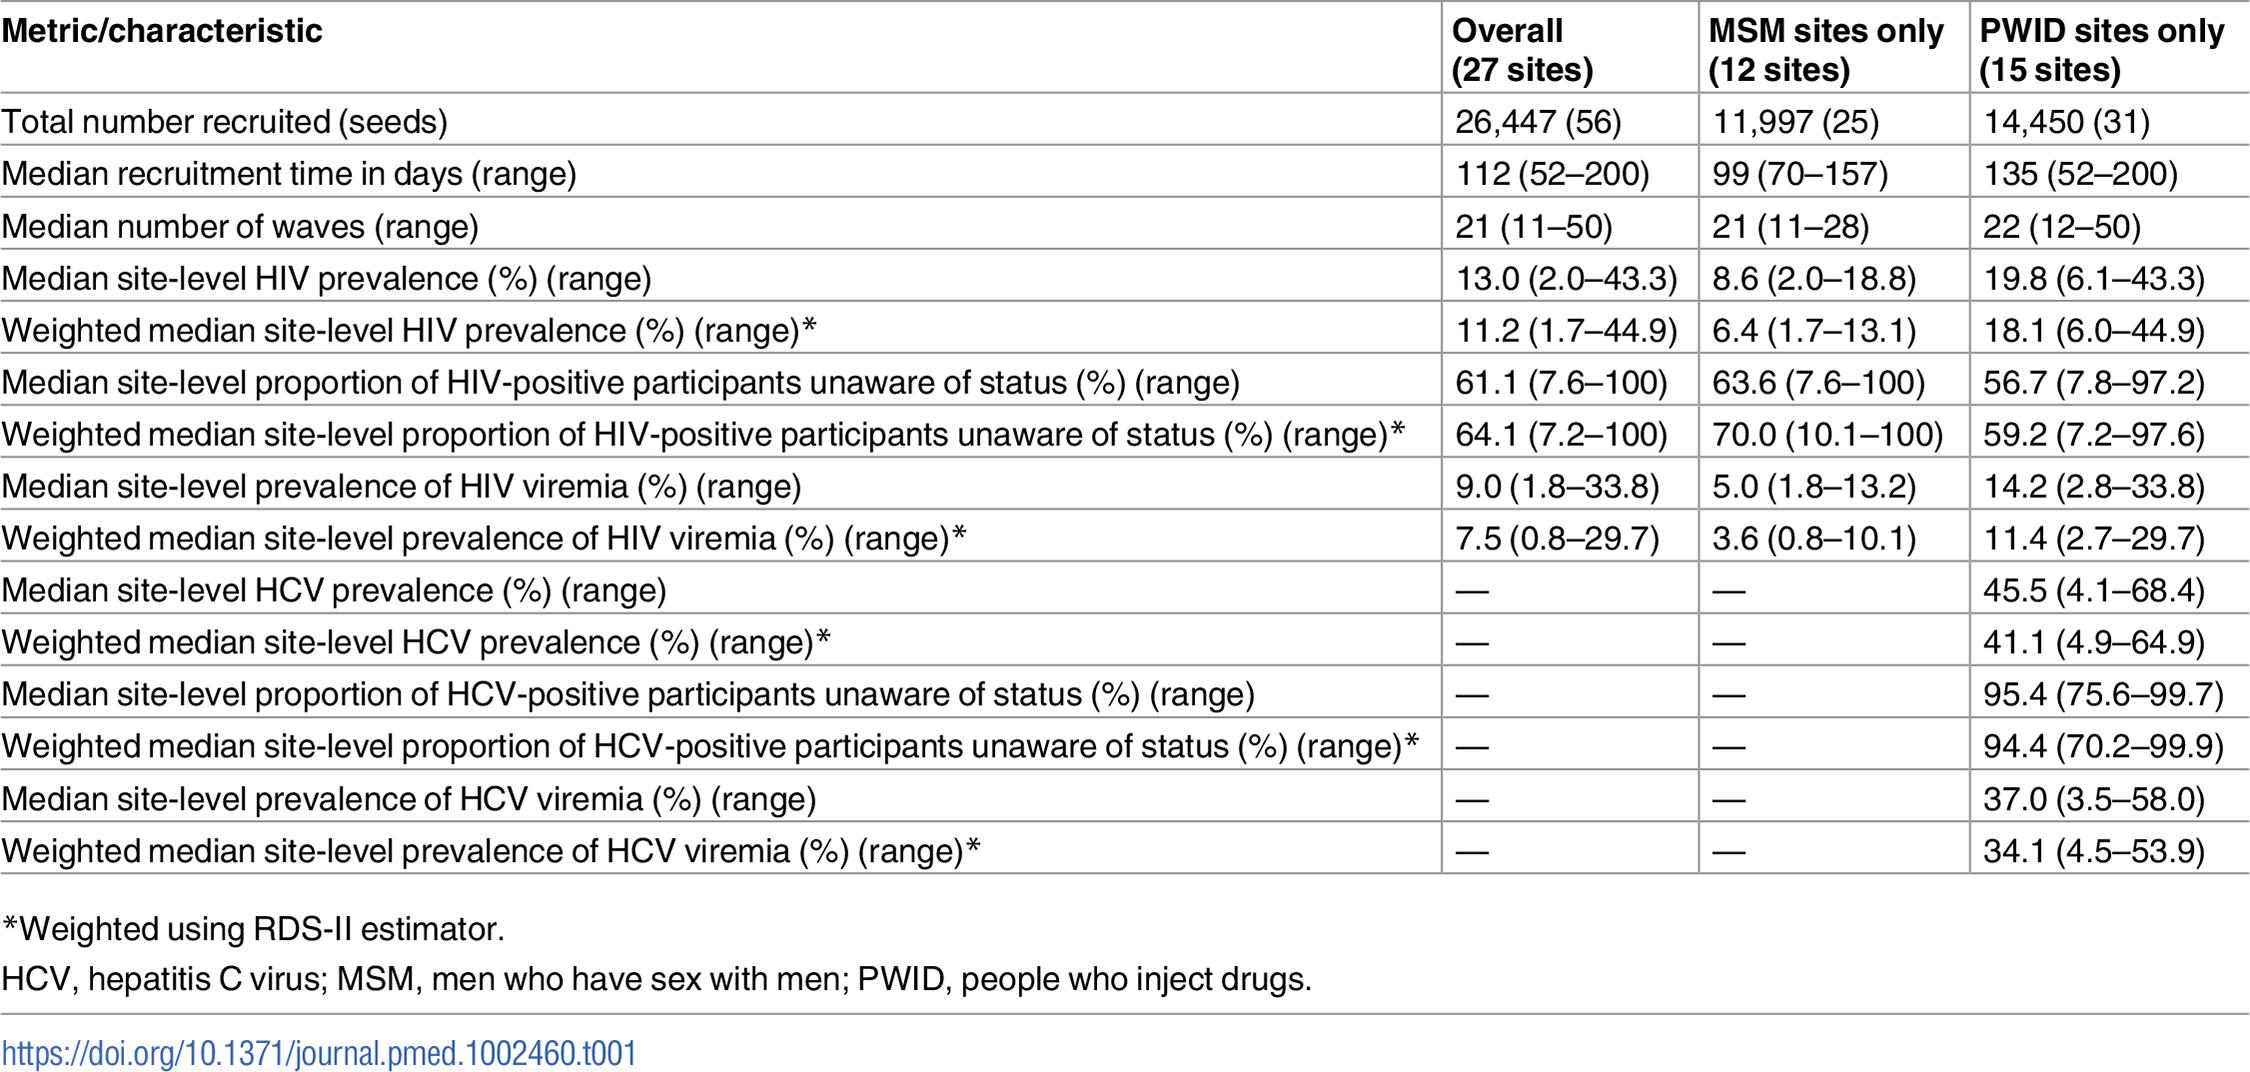 Summary respondent-driven sampling recruitment metrics and HIV/HCV characteristics.